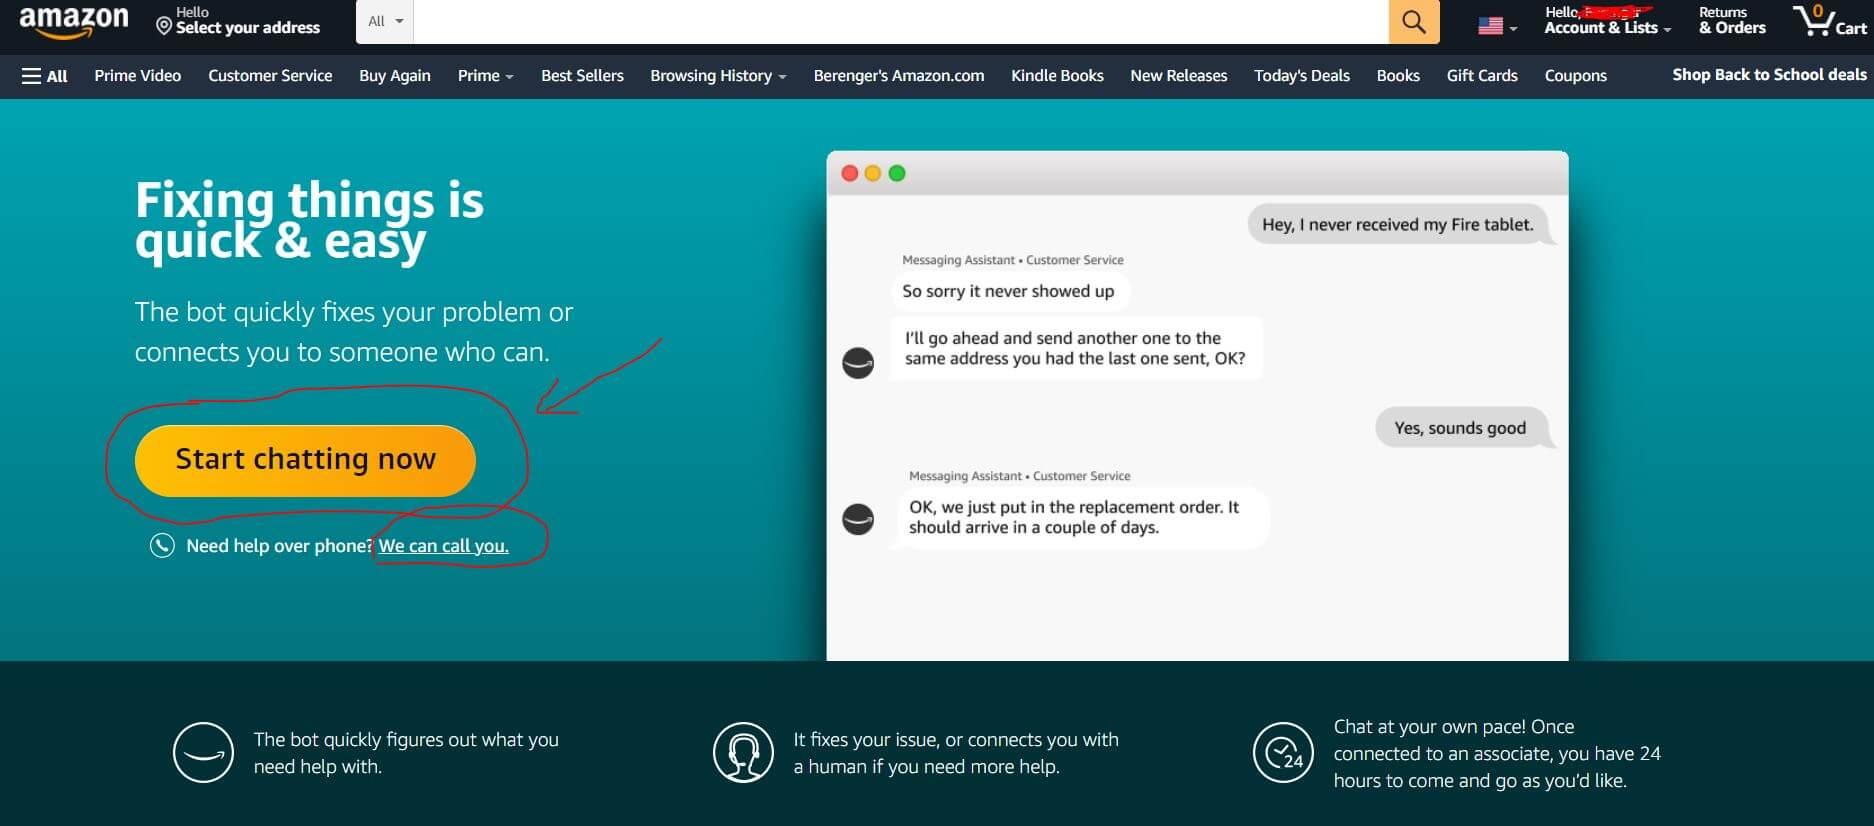 Amazon customer service page